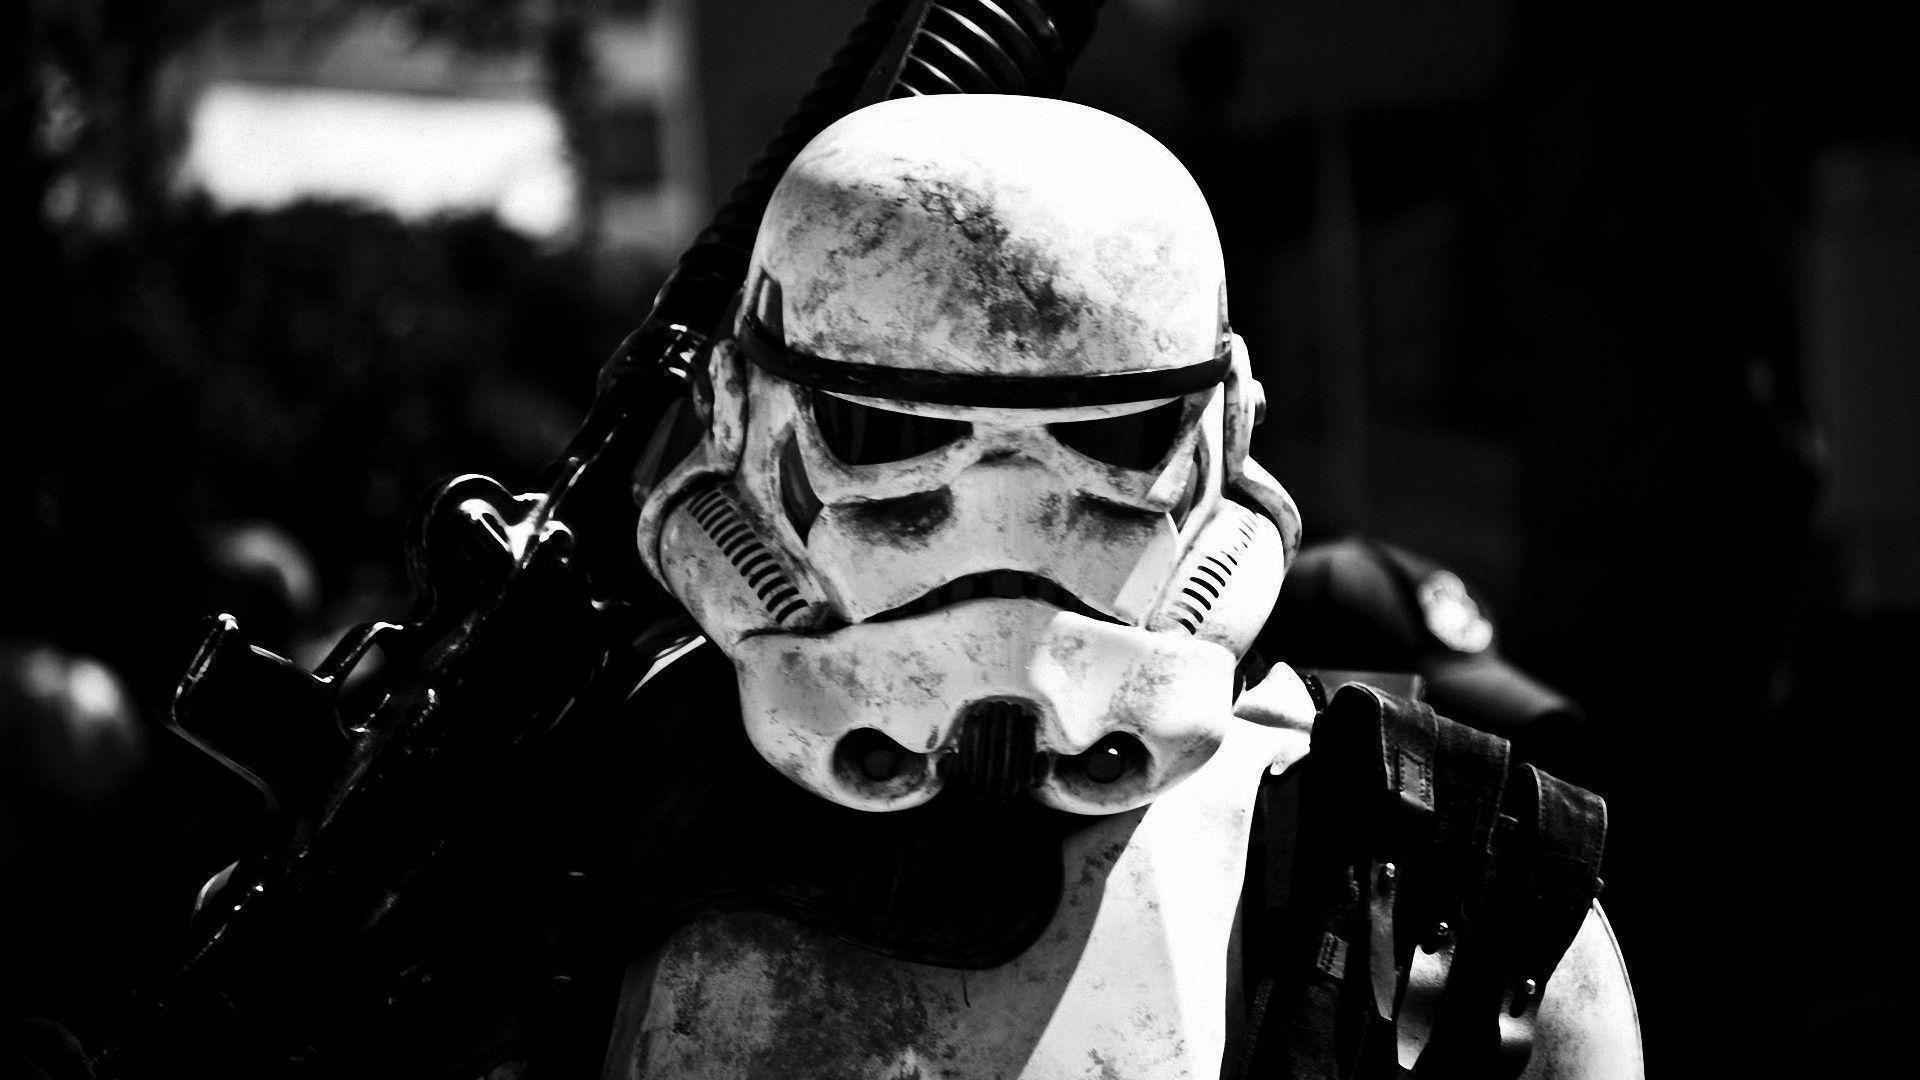 Star wars stormtrooper Wallpapers   Pictures